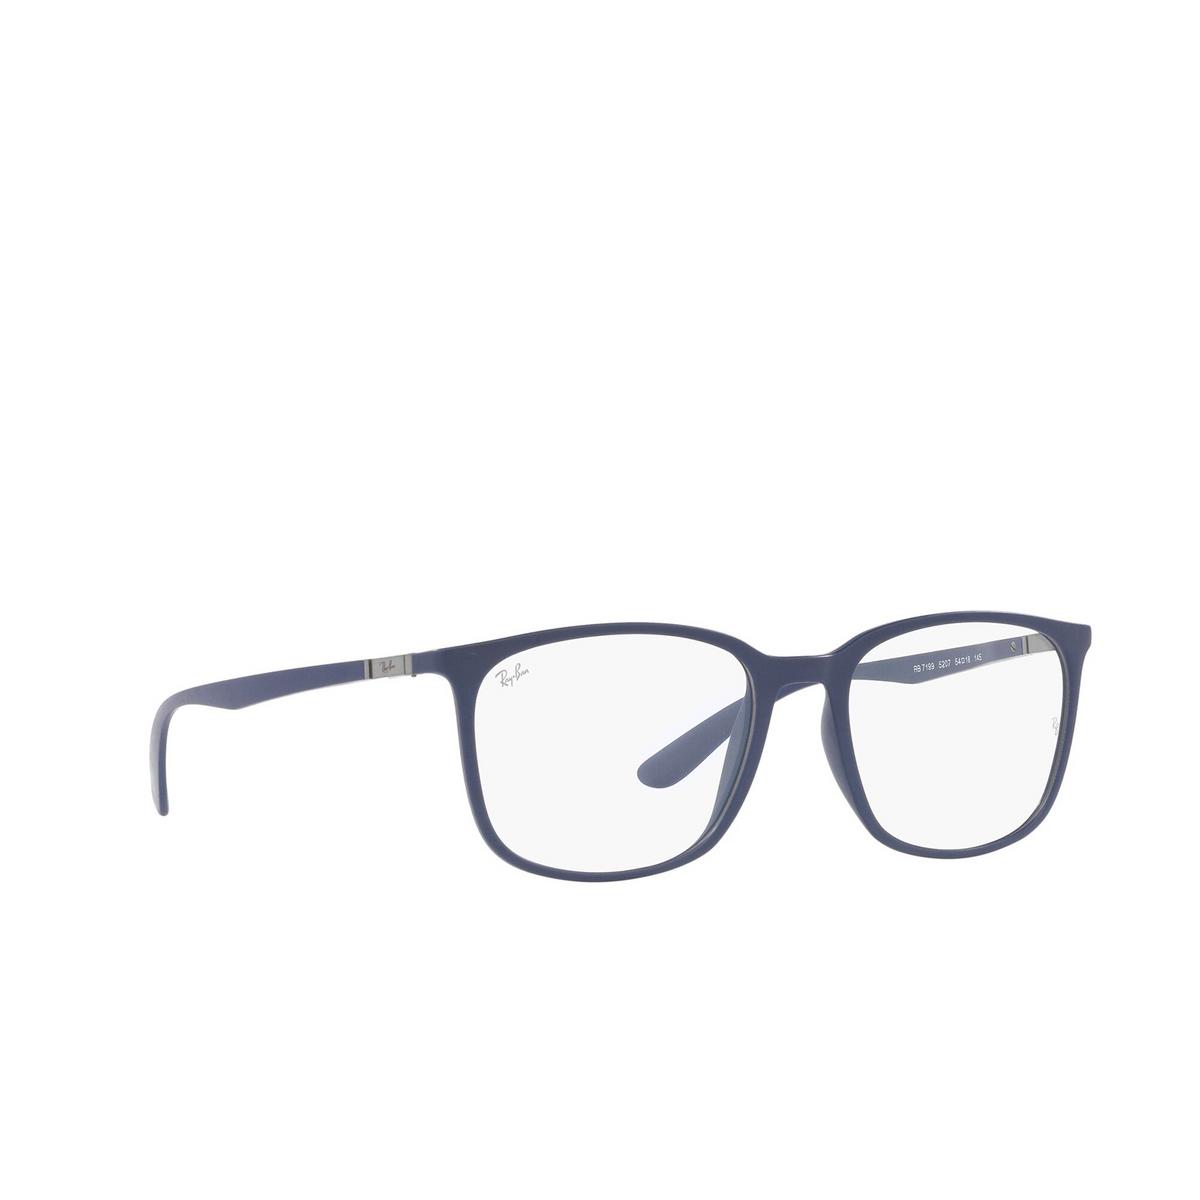 Ray-Ban® Square Eyeglasses: RX7199 color Sand Blue 5207 - three-quarters view.